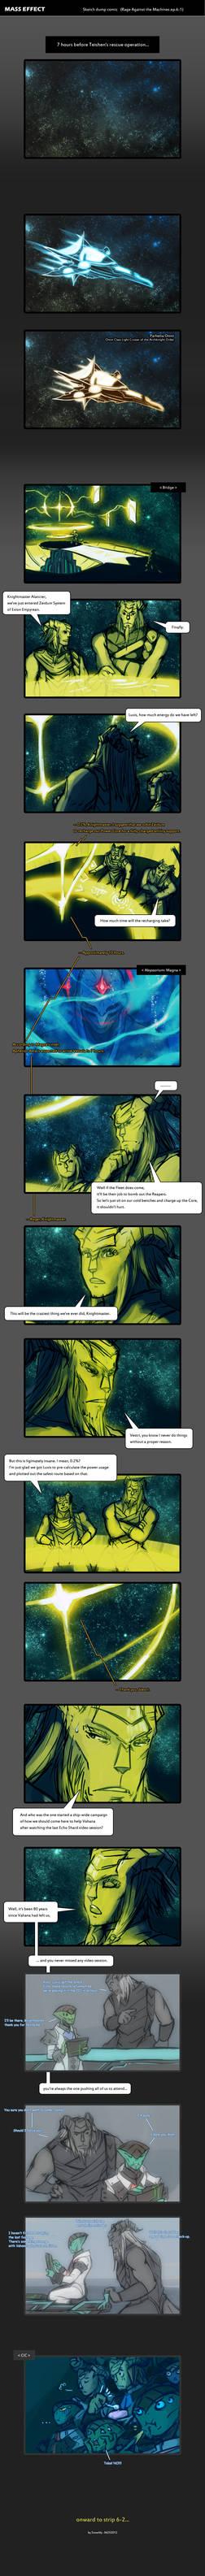 Prothean Reaper War by StellarStateLogic on DeviantArt